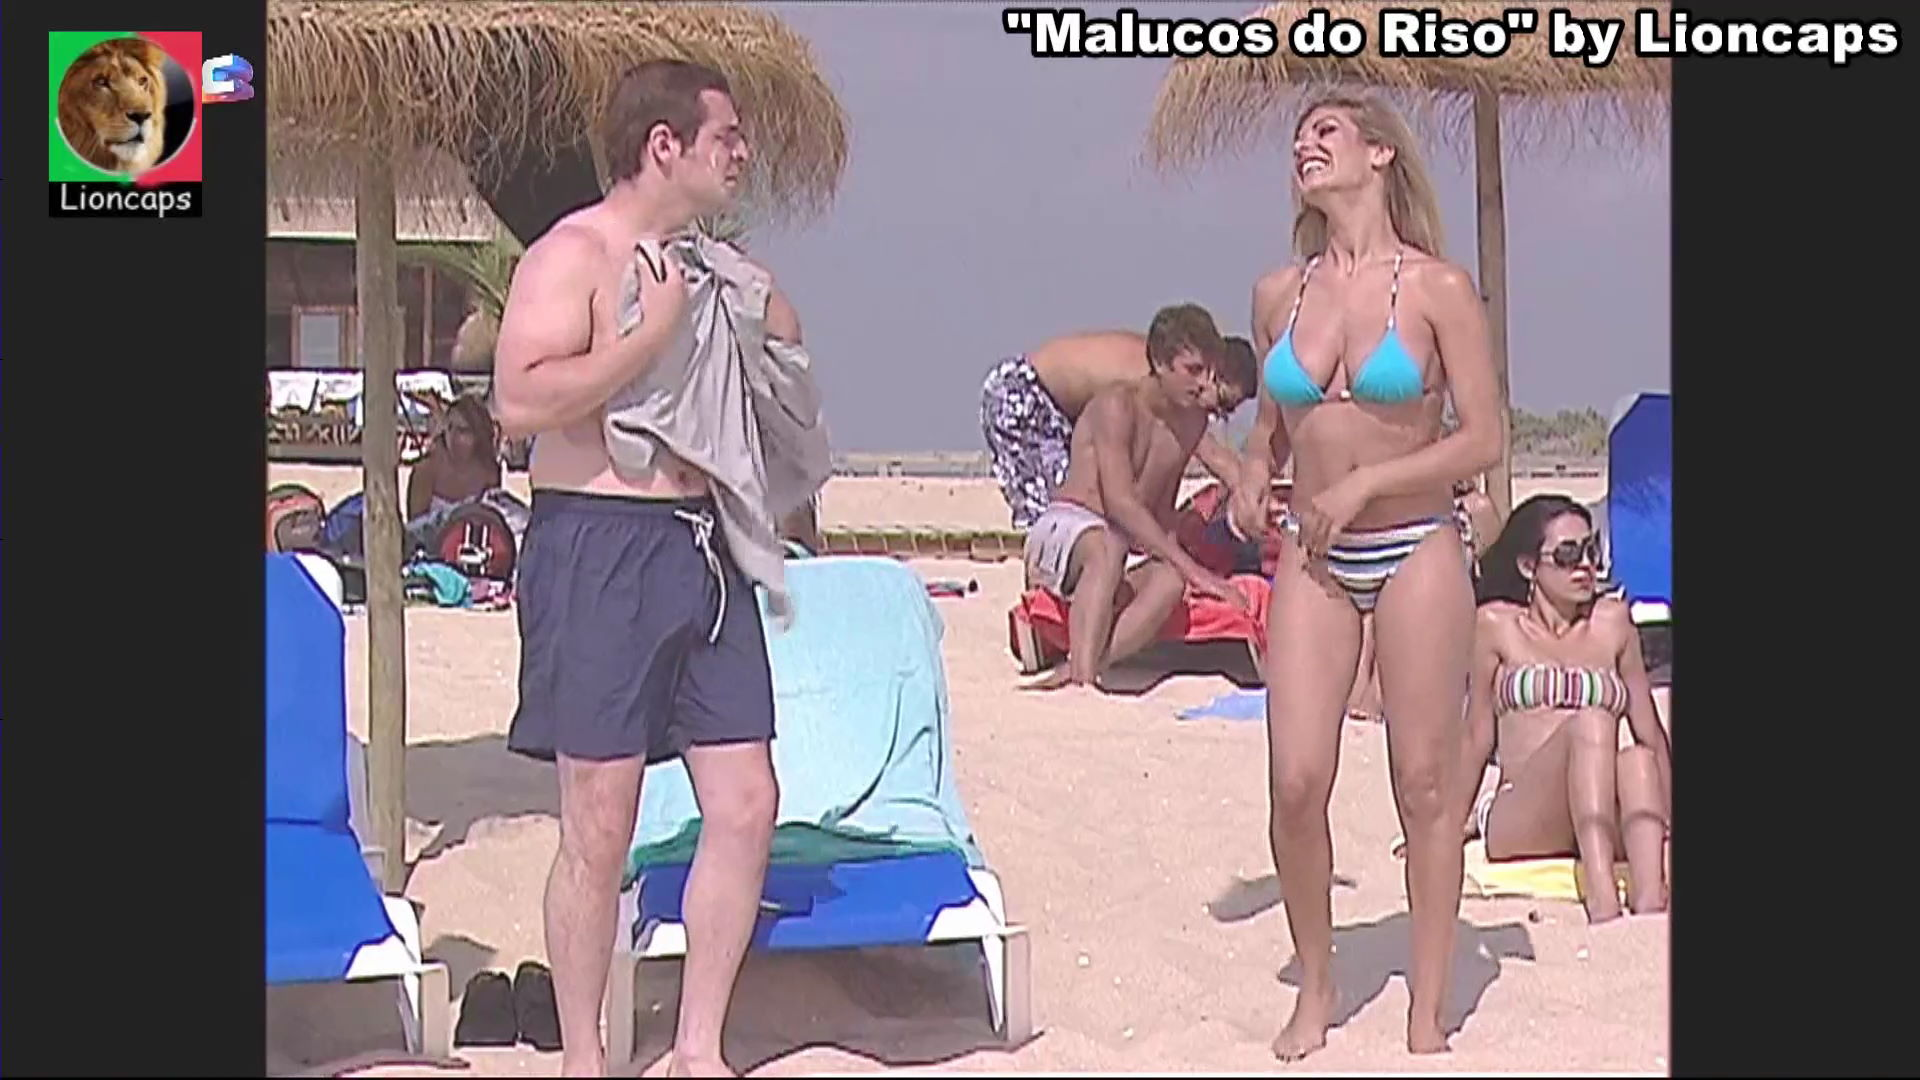 475165180_malucos_riso_alda_gomes_vs190malucos_riso_602_15072_122_424lo.JPG